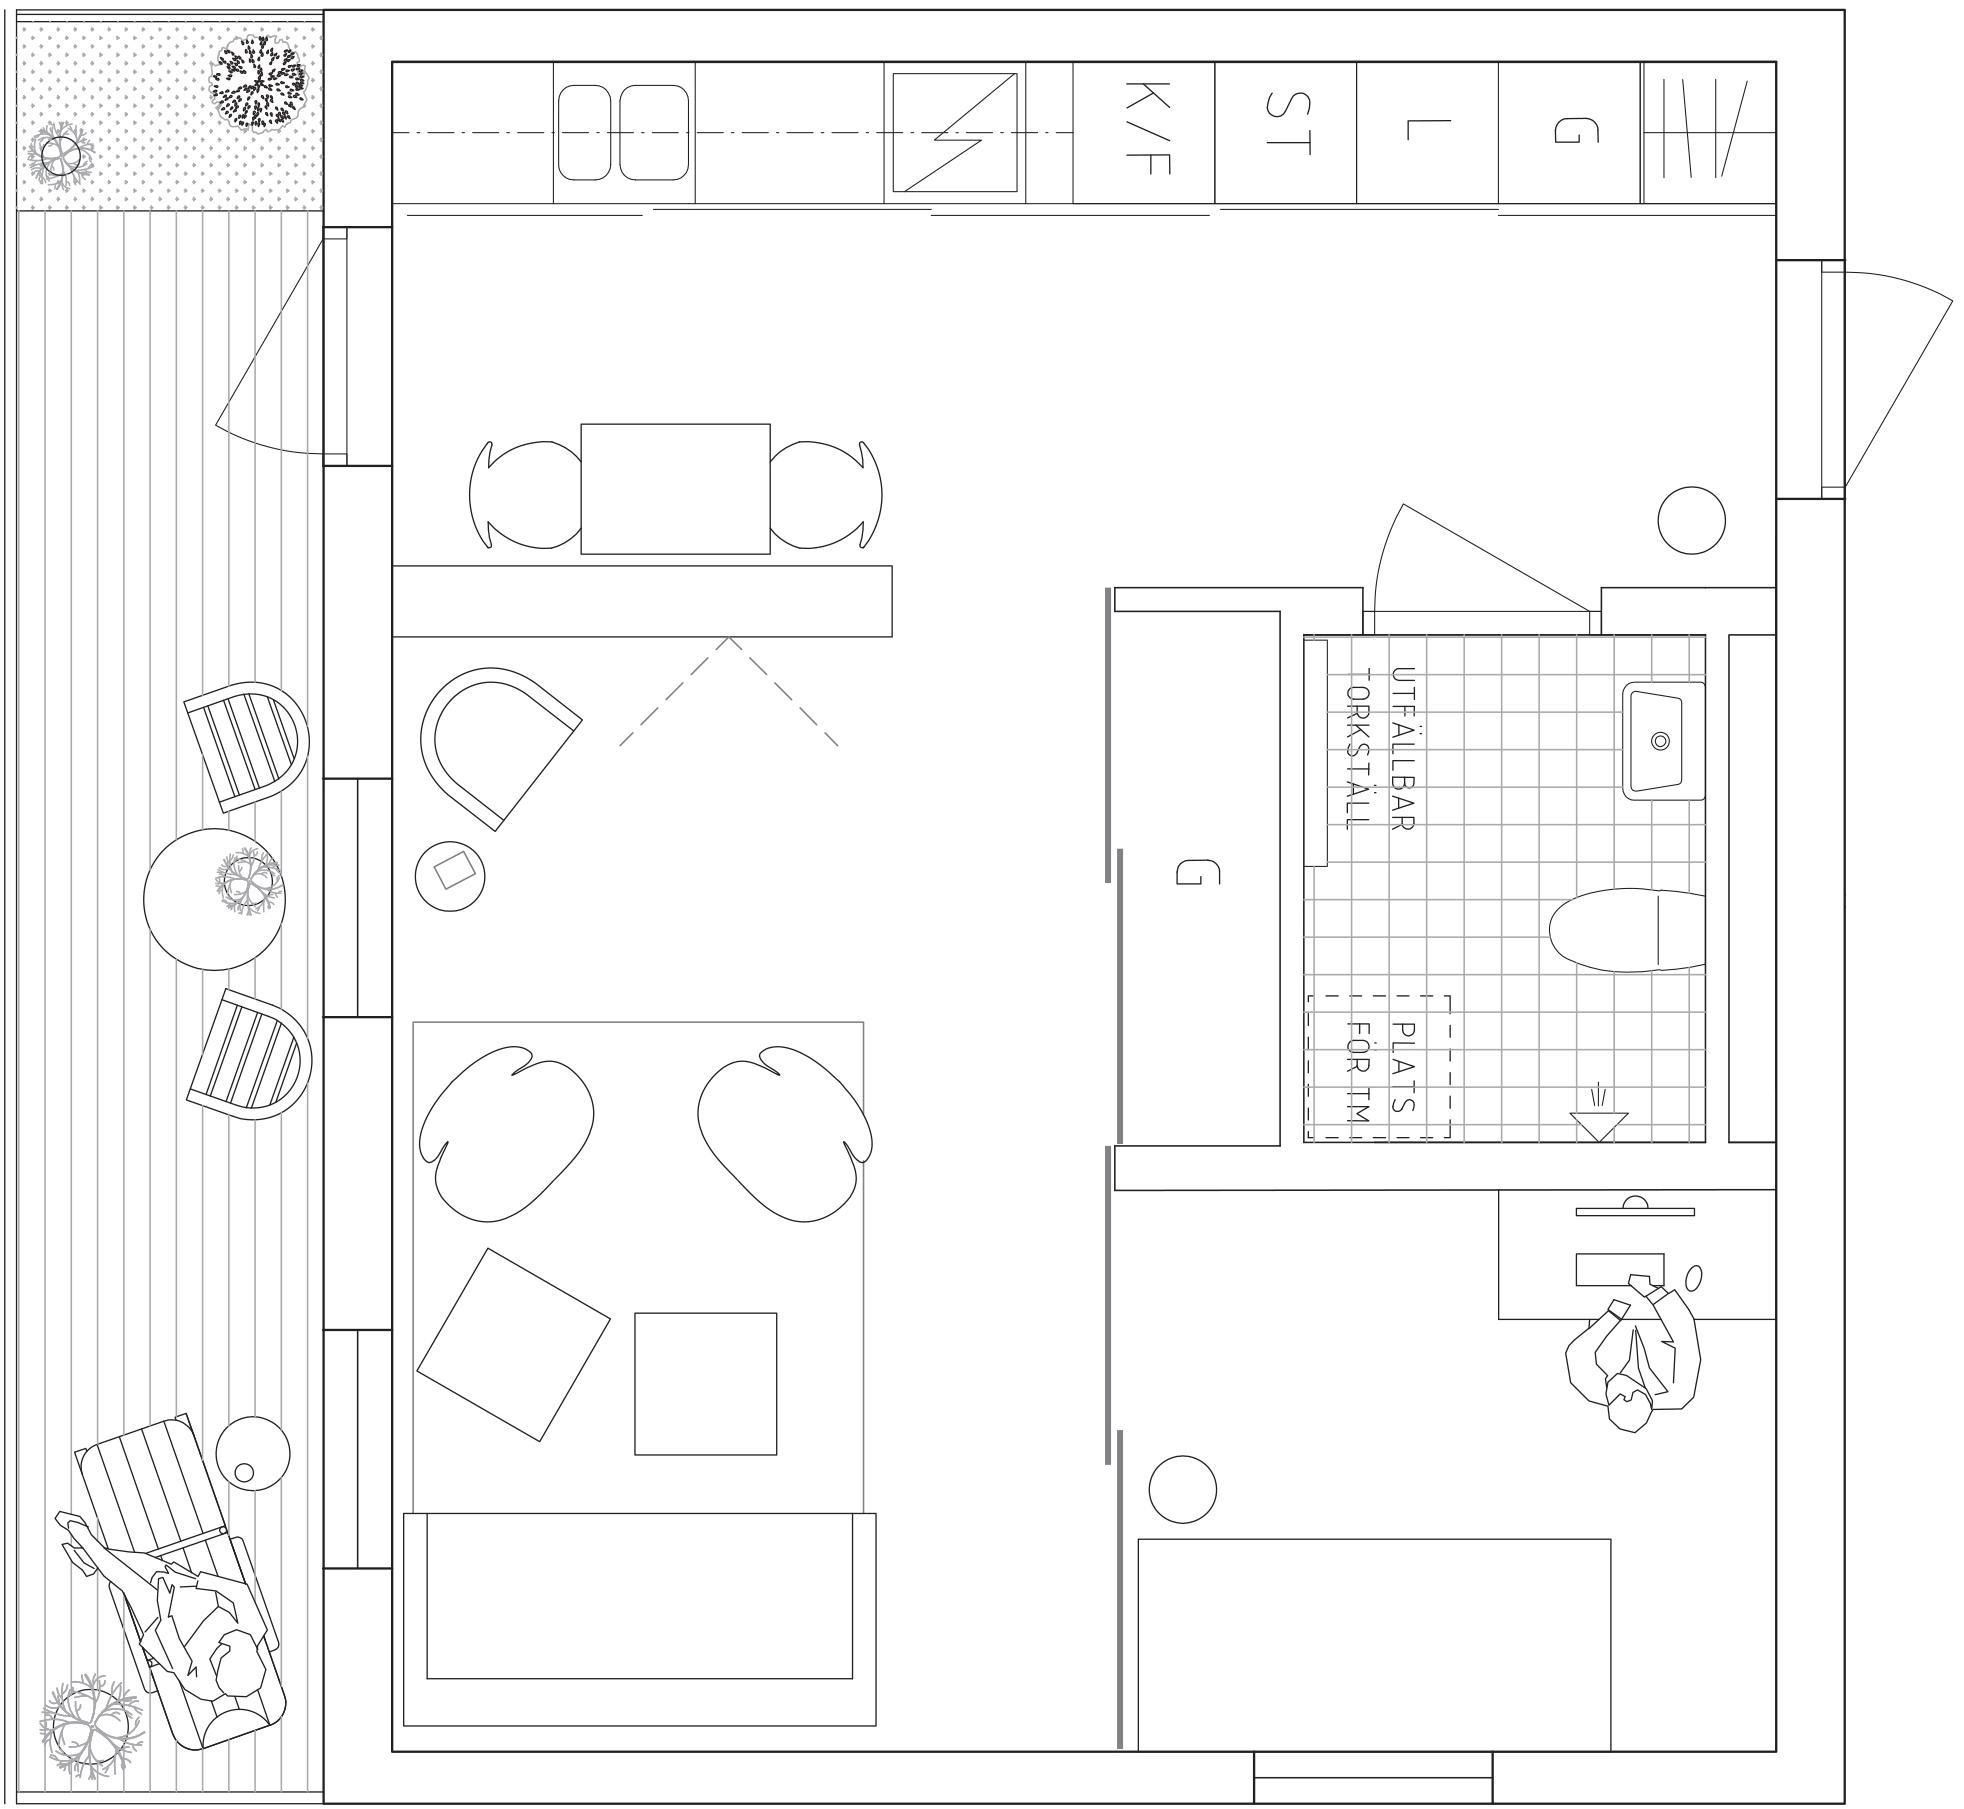 R:Nyhem0952720100Skisspaketering4cases_planer & sektioner Mo